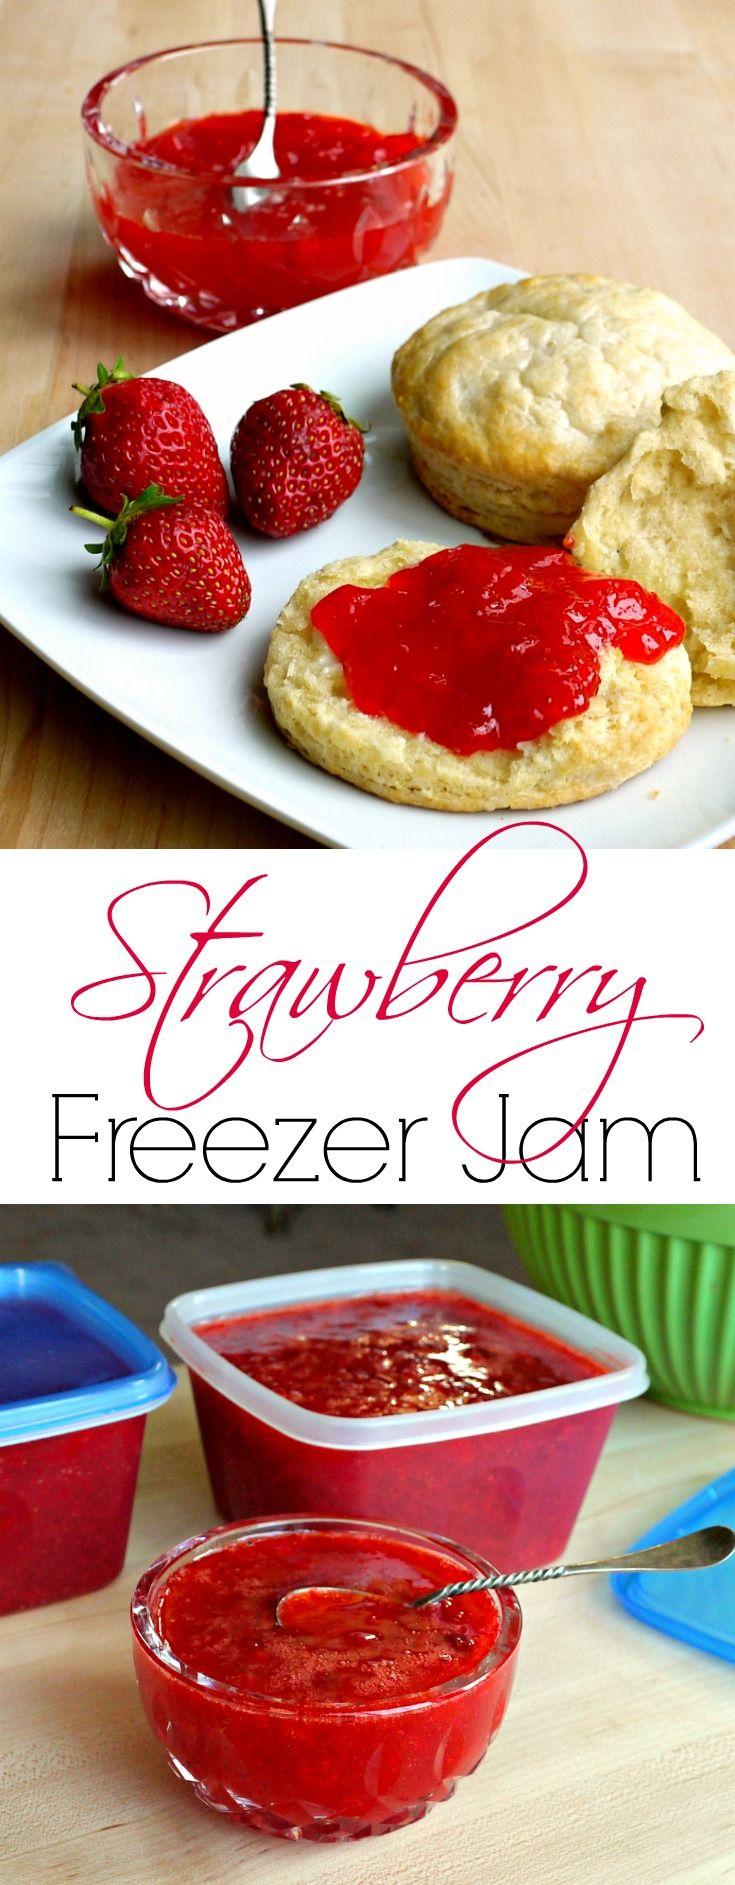 Strawberry Freezer Jam {Tutorial} - Strawberry freezer jam is one of the easiest ways to preserve the fresh taste of summer.